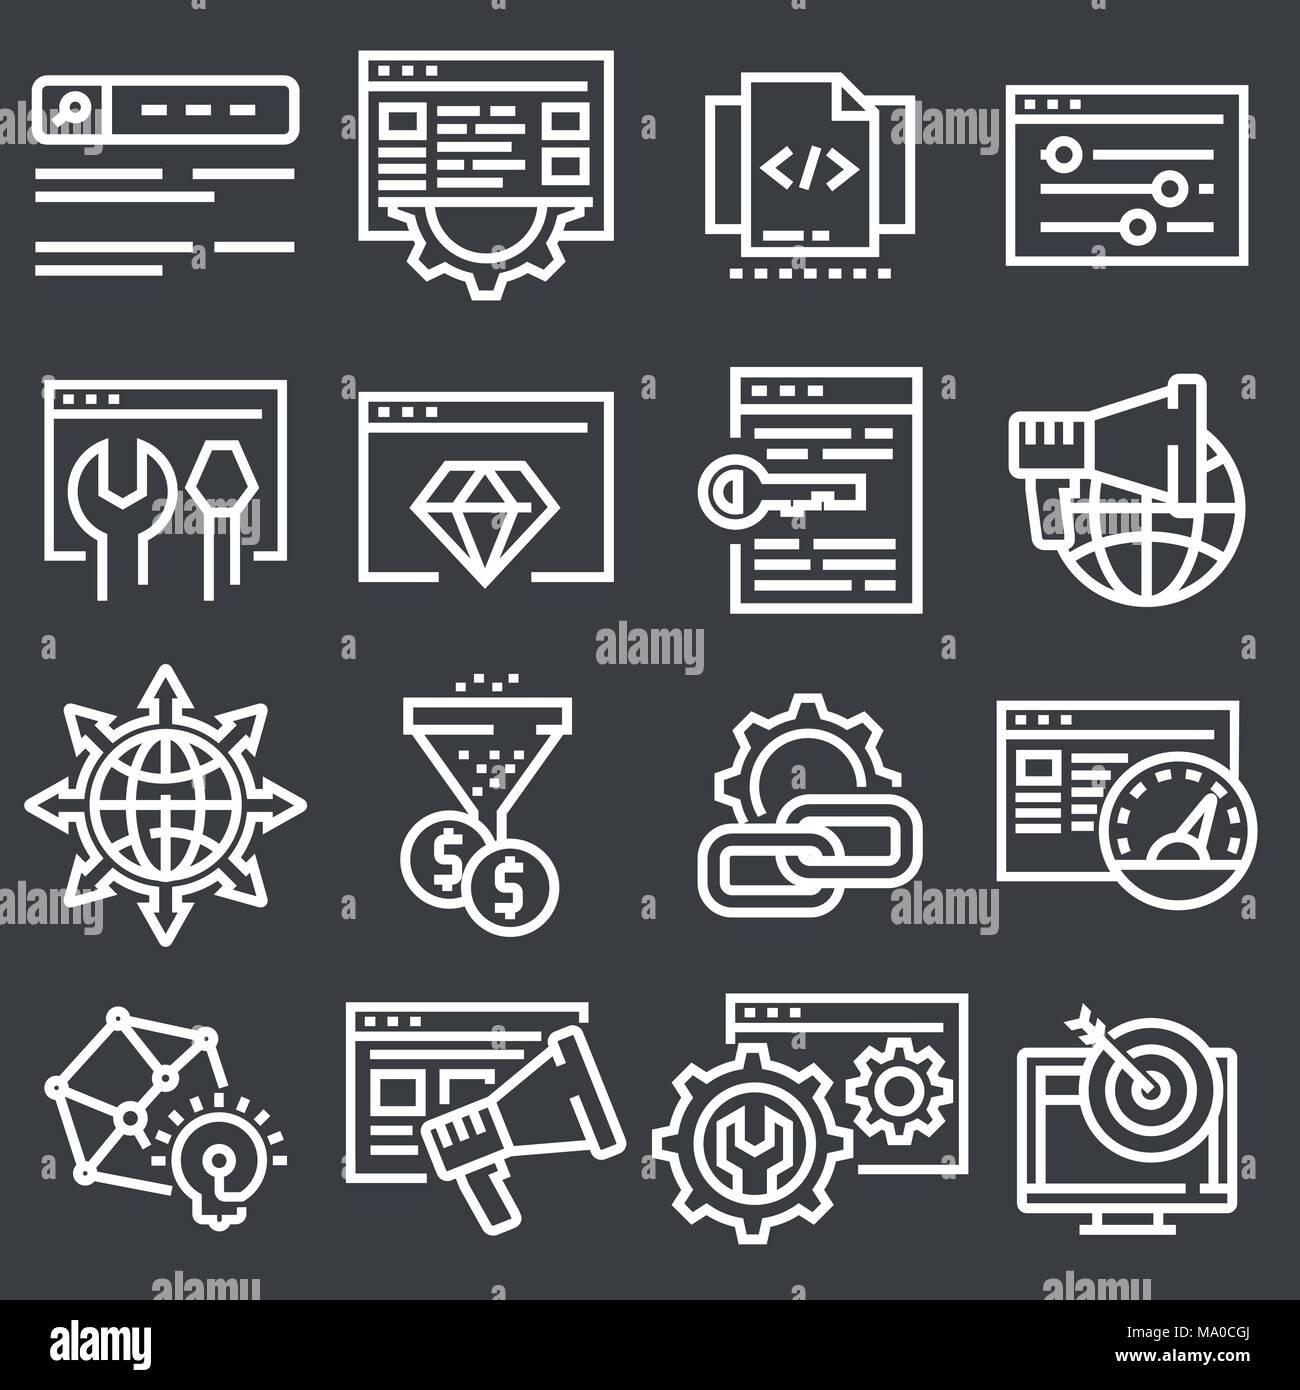 Set of Vector SEO Search Engine Optimisation Elements Icons Illustration - Stock Image